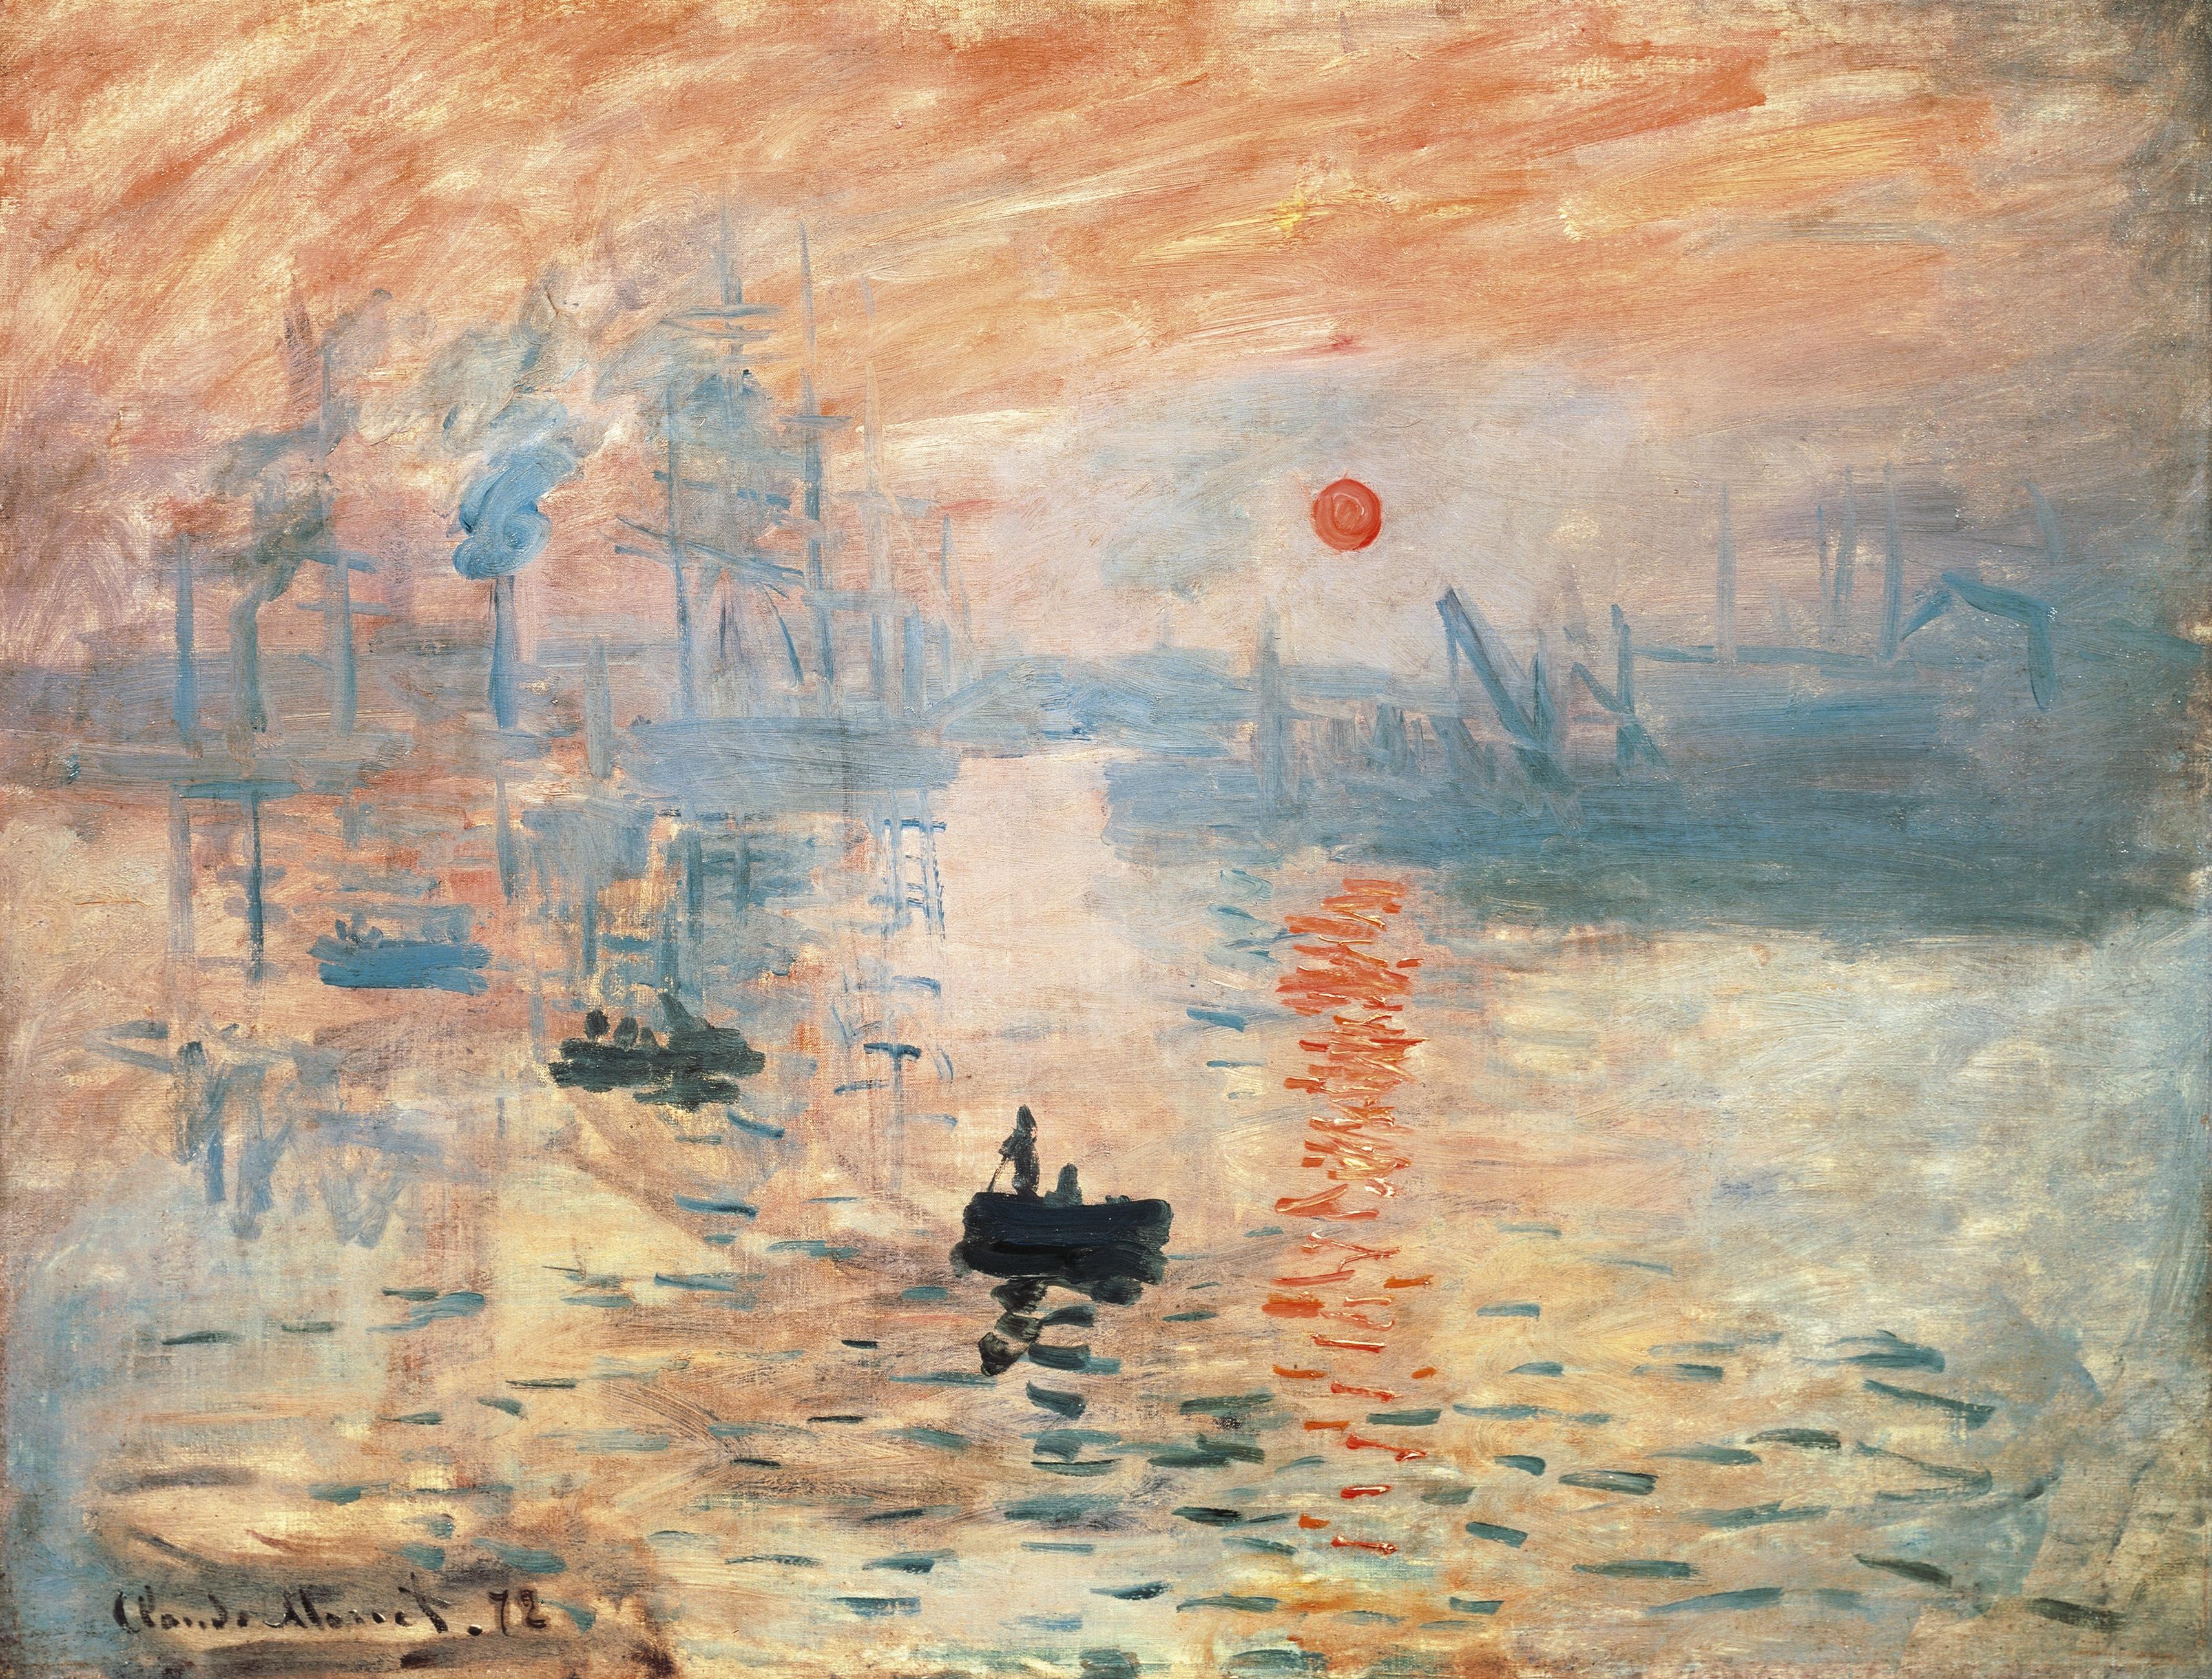 Impression, sunrise (Impression, Soleil Levant), 1872, by Claude Monet (1840-1926). (Photo by DeAgostini/Getty Images)